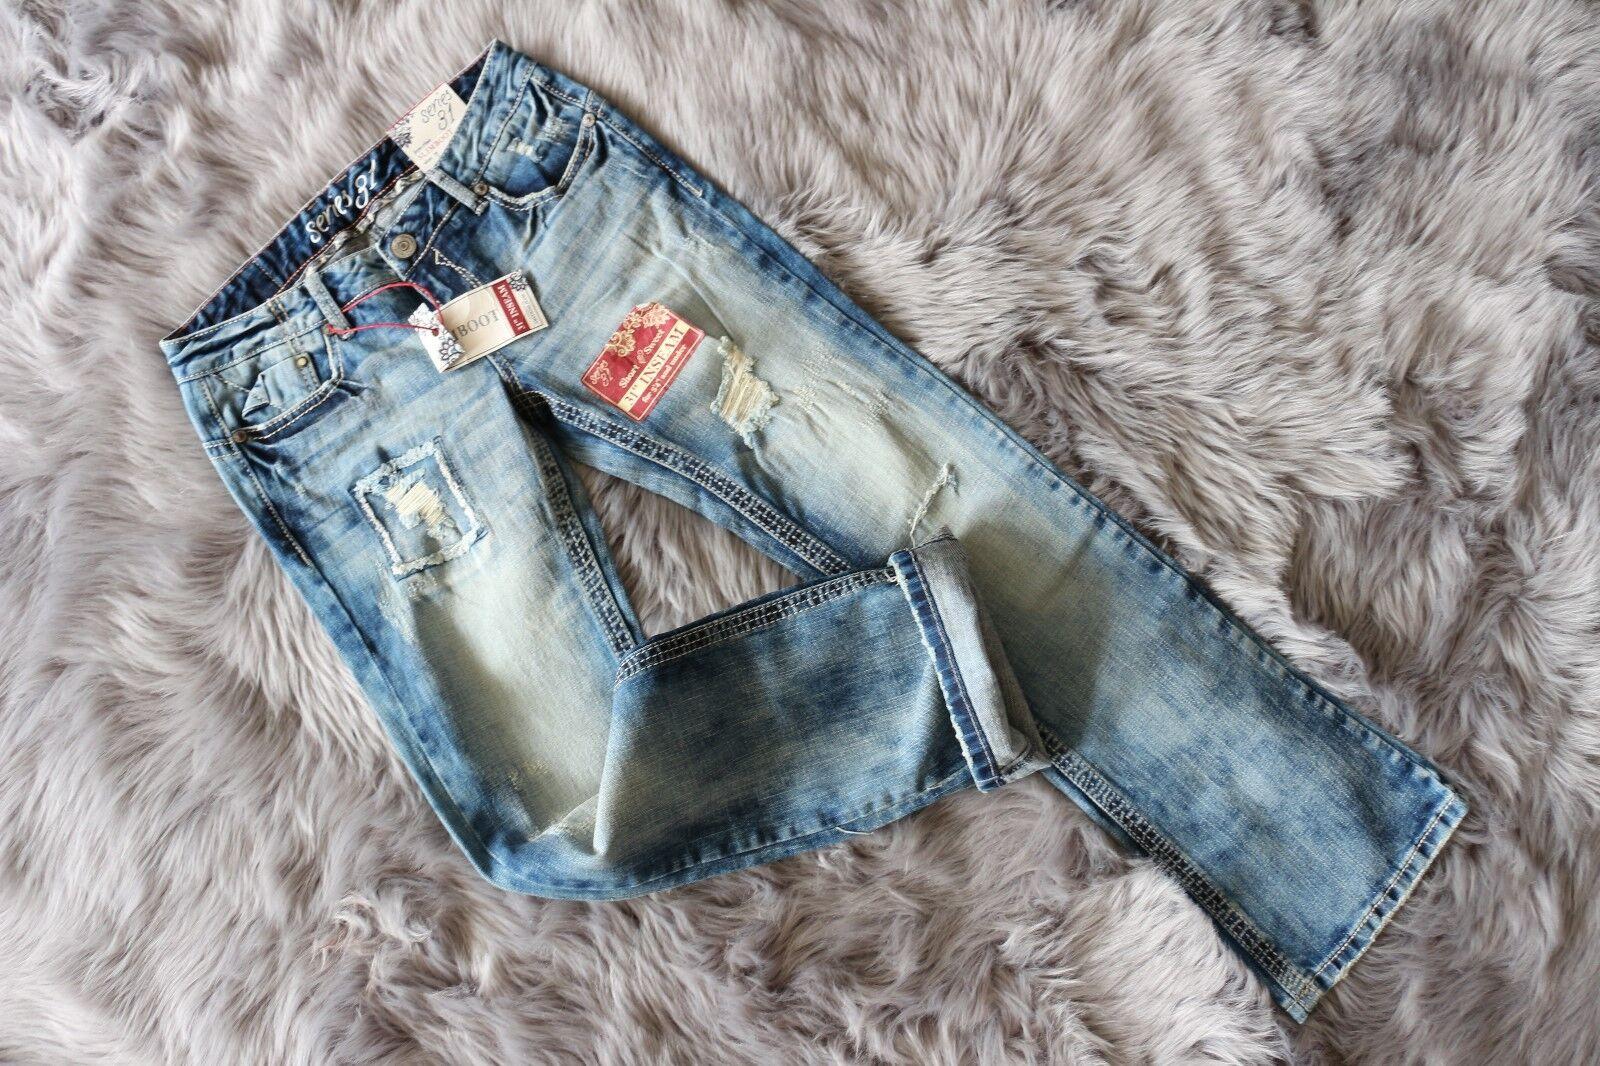 New Series 31 Short&Sweet Women Jeans  bluee Low-Rise Slim Boot W29